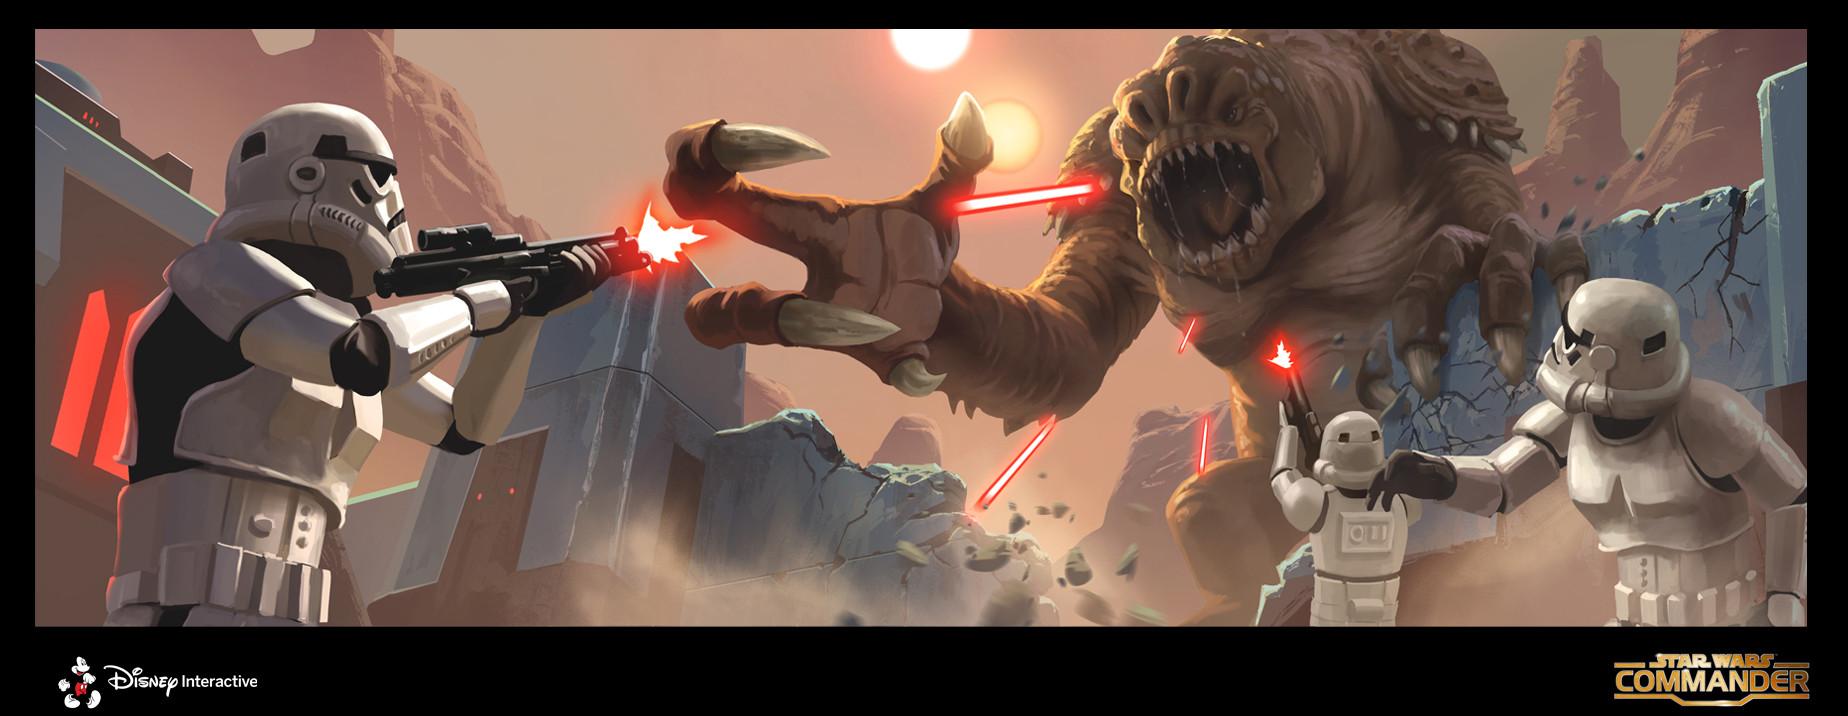 ArtStation - Star Wars Commander, David Le Merrer